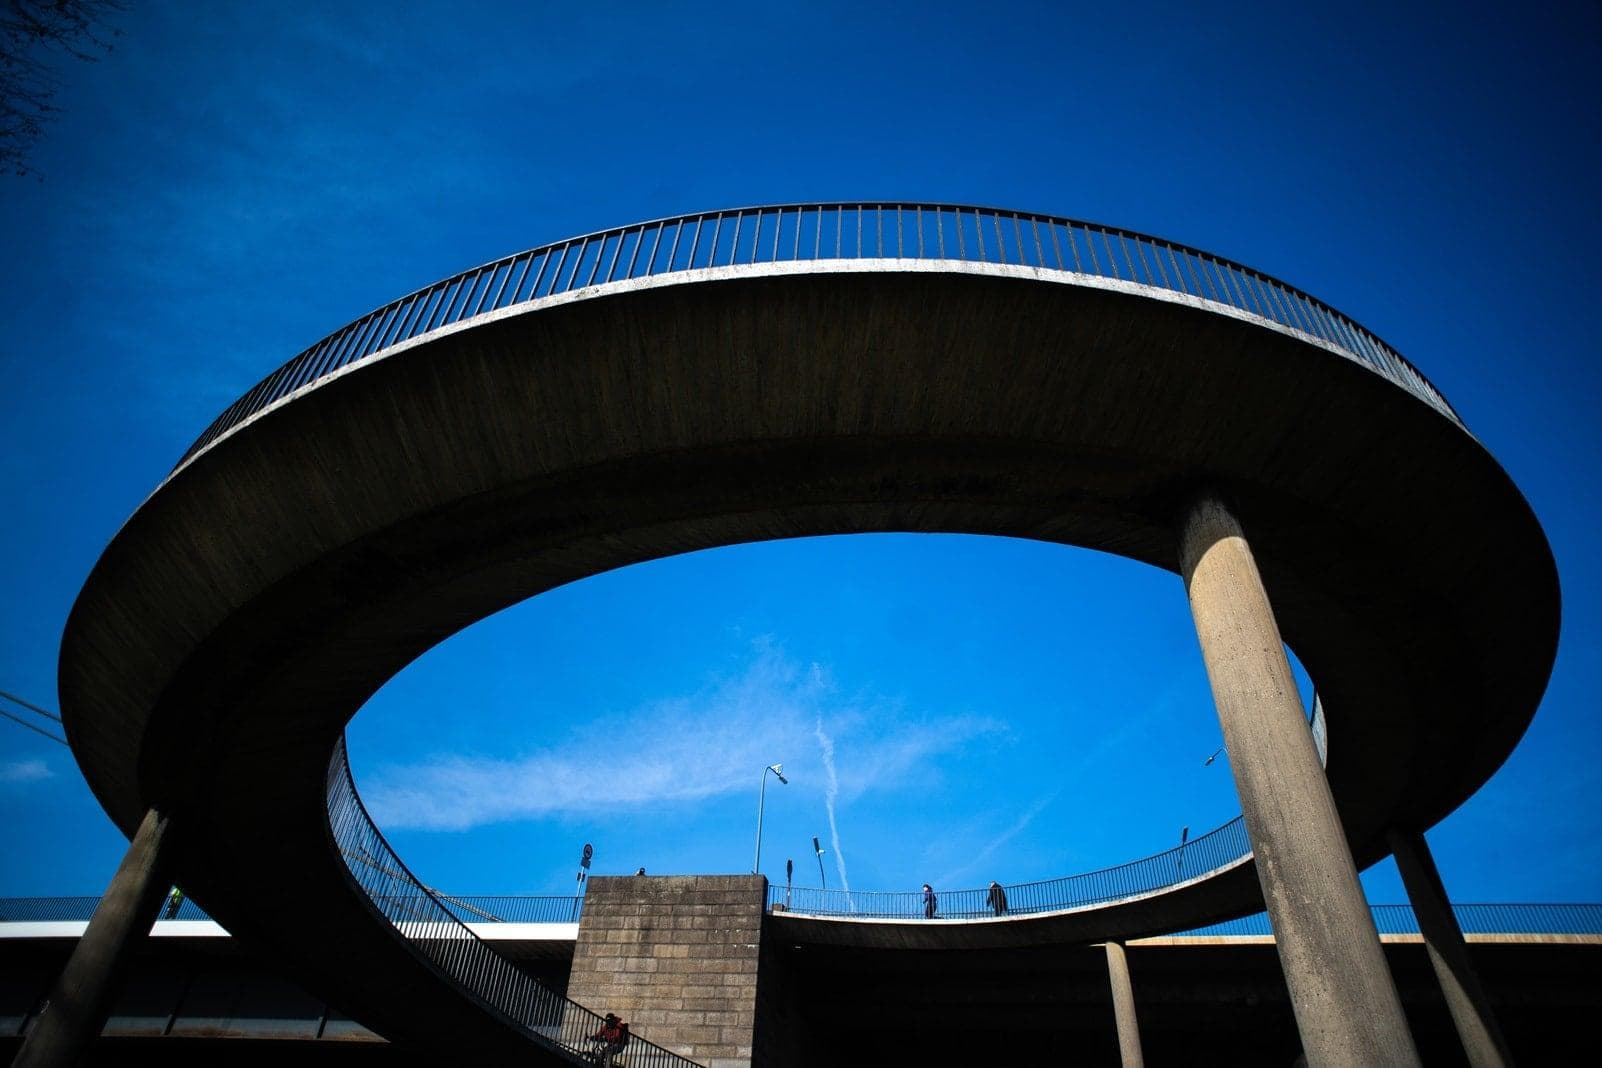 Düsseldorf Blauer Himmel Theodor-Heuss-Brücke